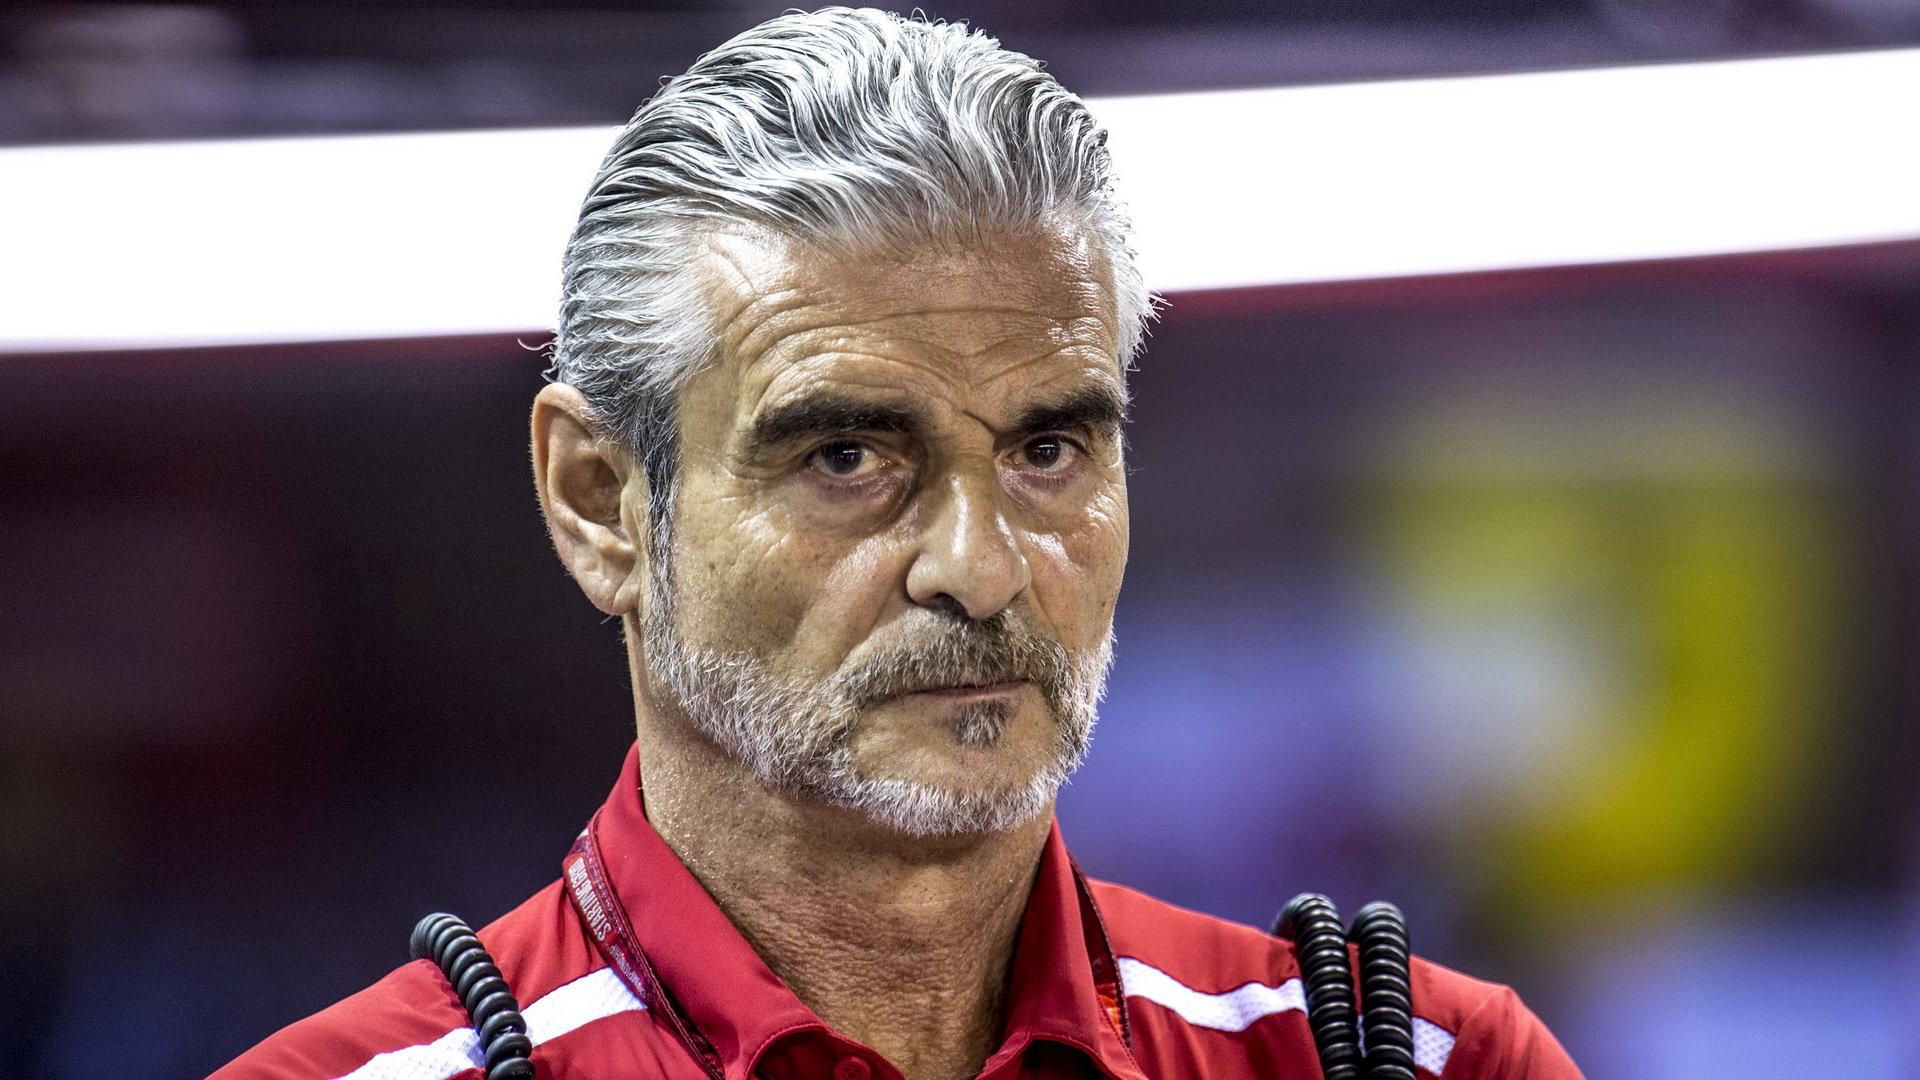 Maurizio Arrivabene v roli šéfa závodního týmu skončil, nahradil jej technický ředitel Mattia Binotto